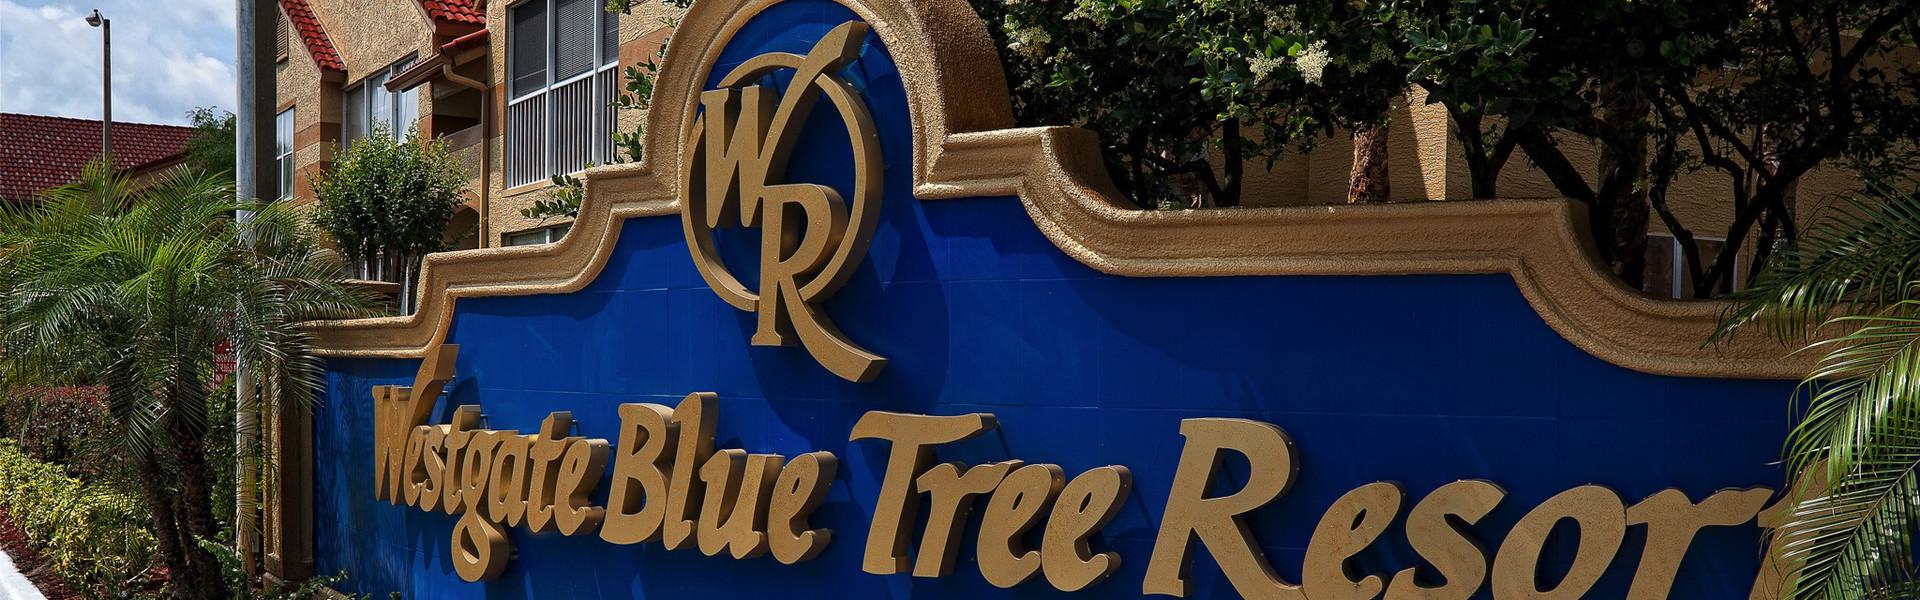 Take a virtual tour through our family friendly resort, Westgate Blue Tree Resort.